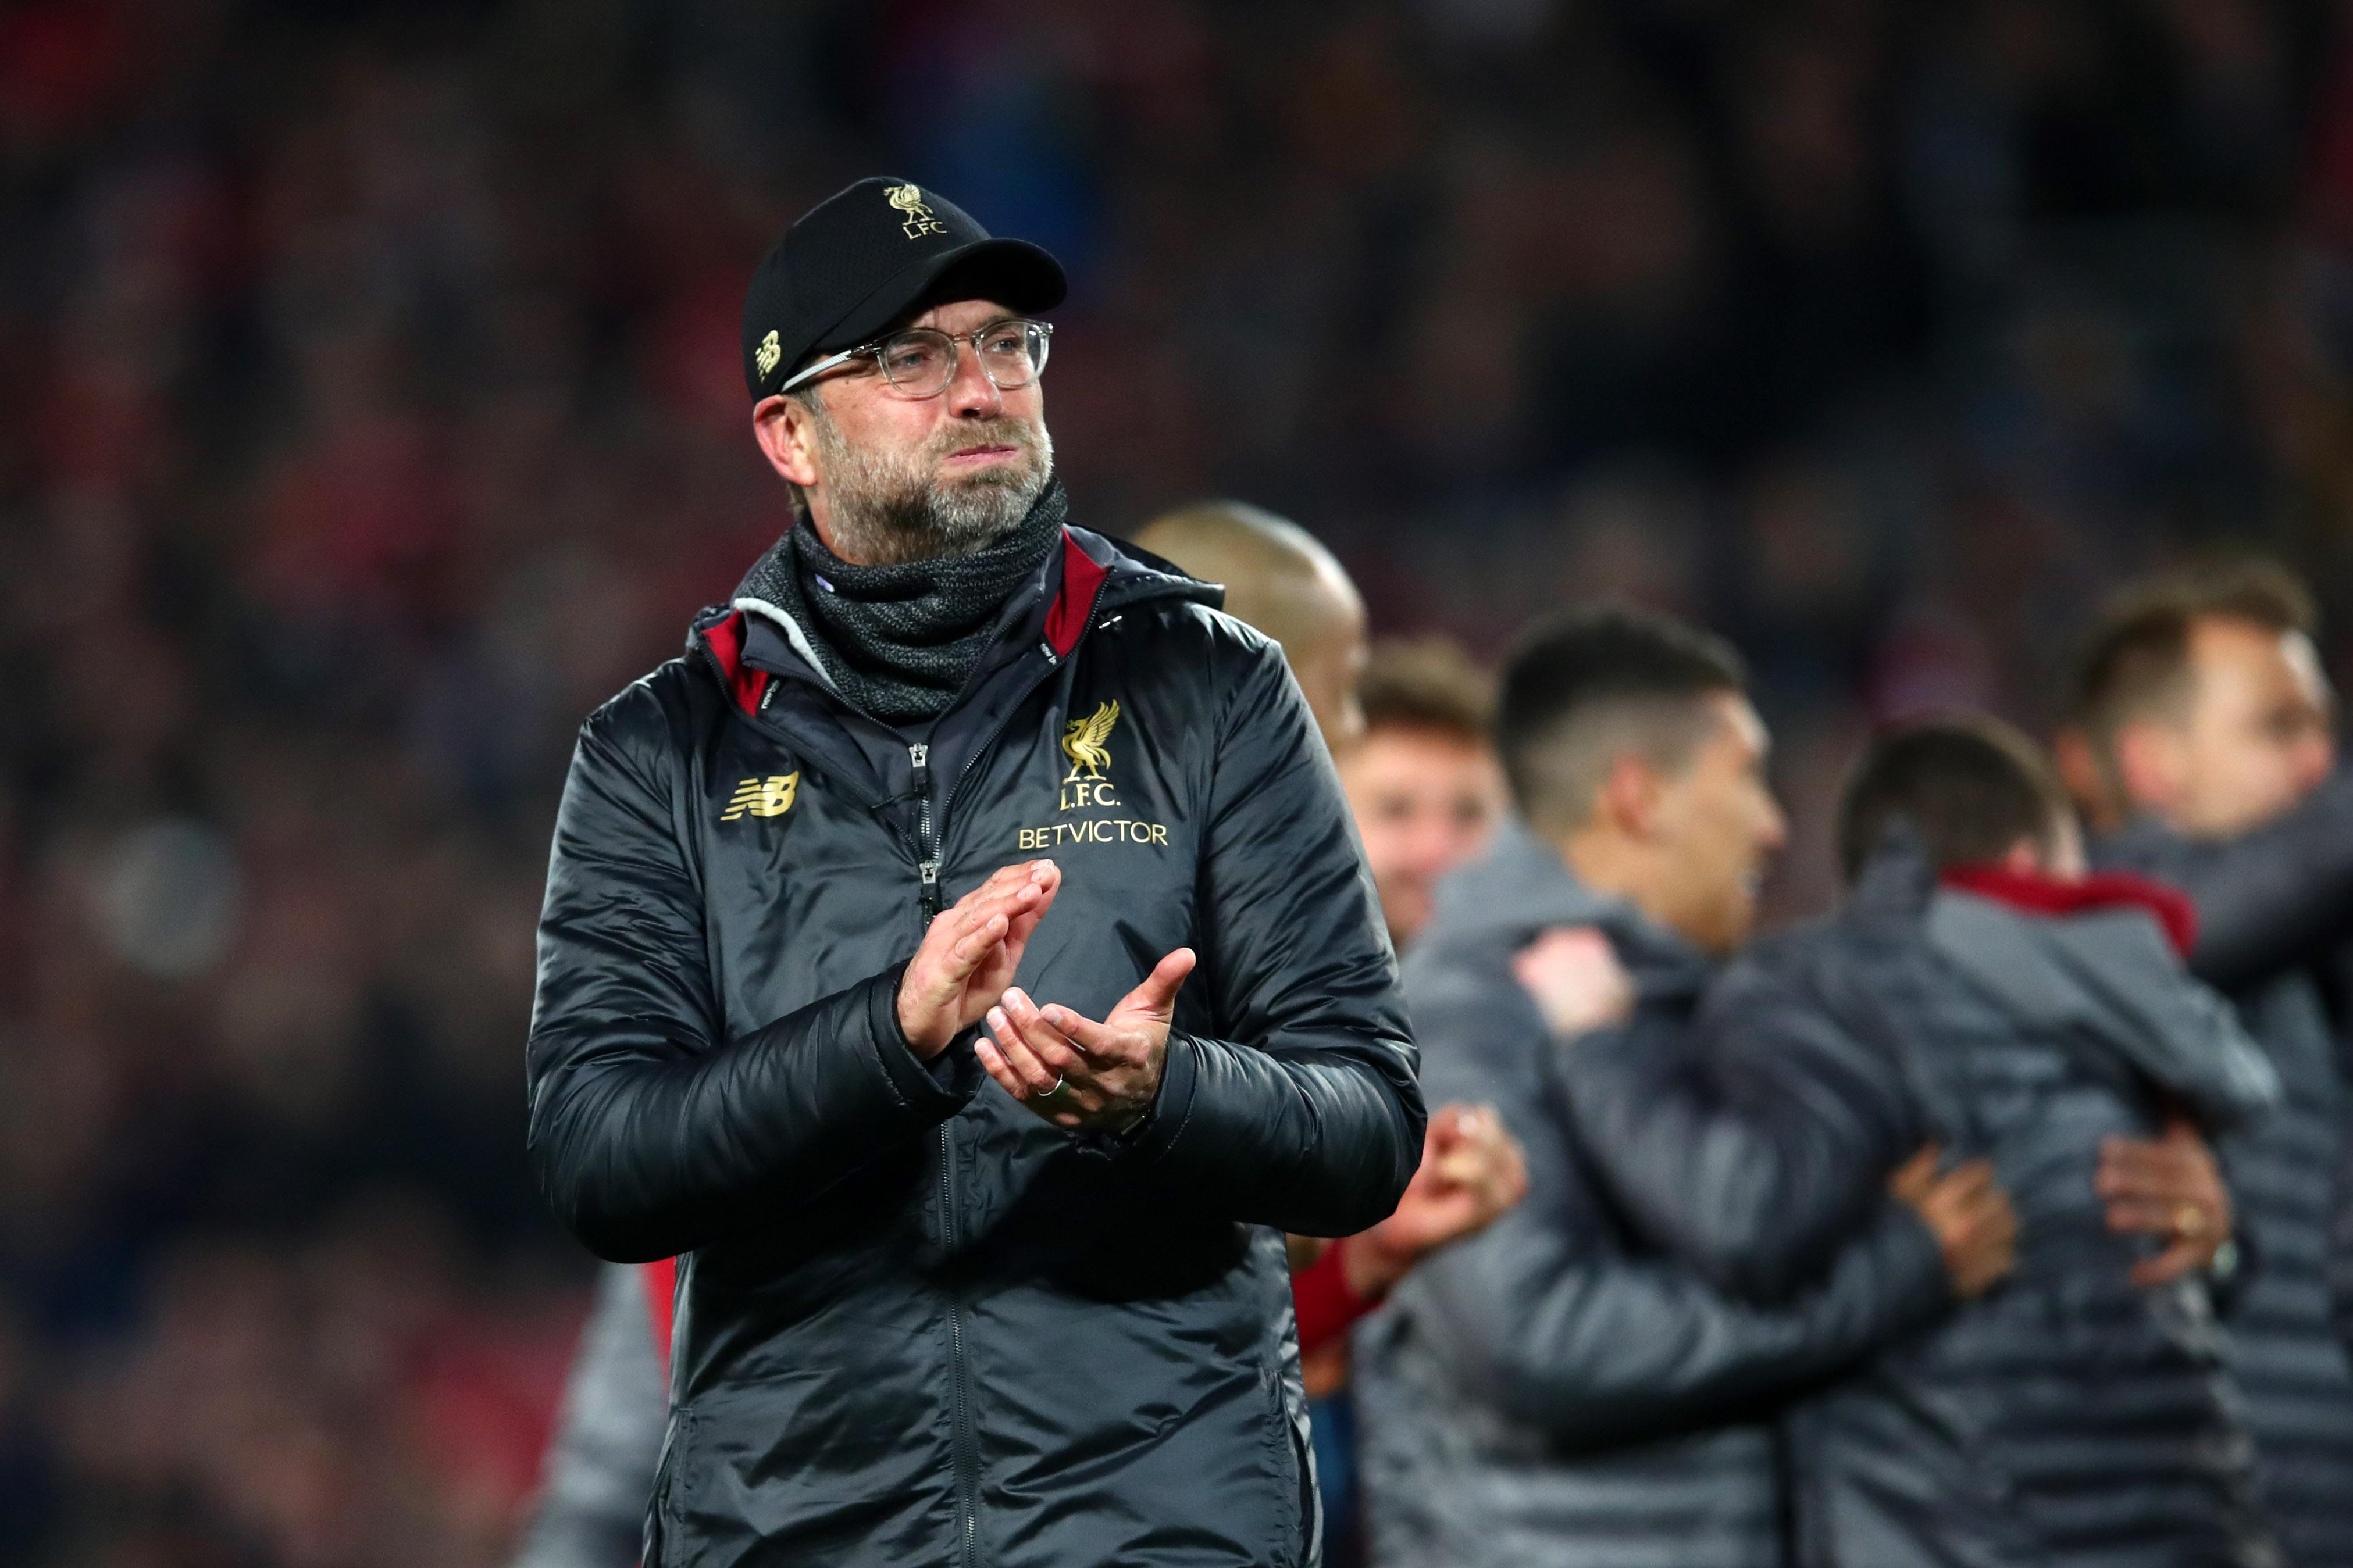 Jurgen Klopp Liverpool Barcelona UEFA Champions League 05/07/19